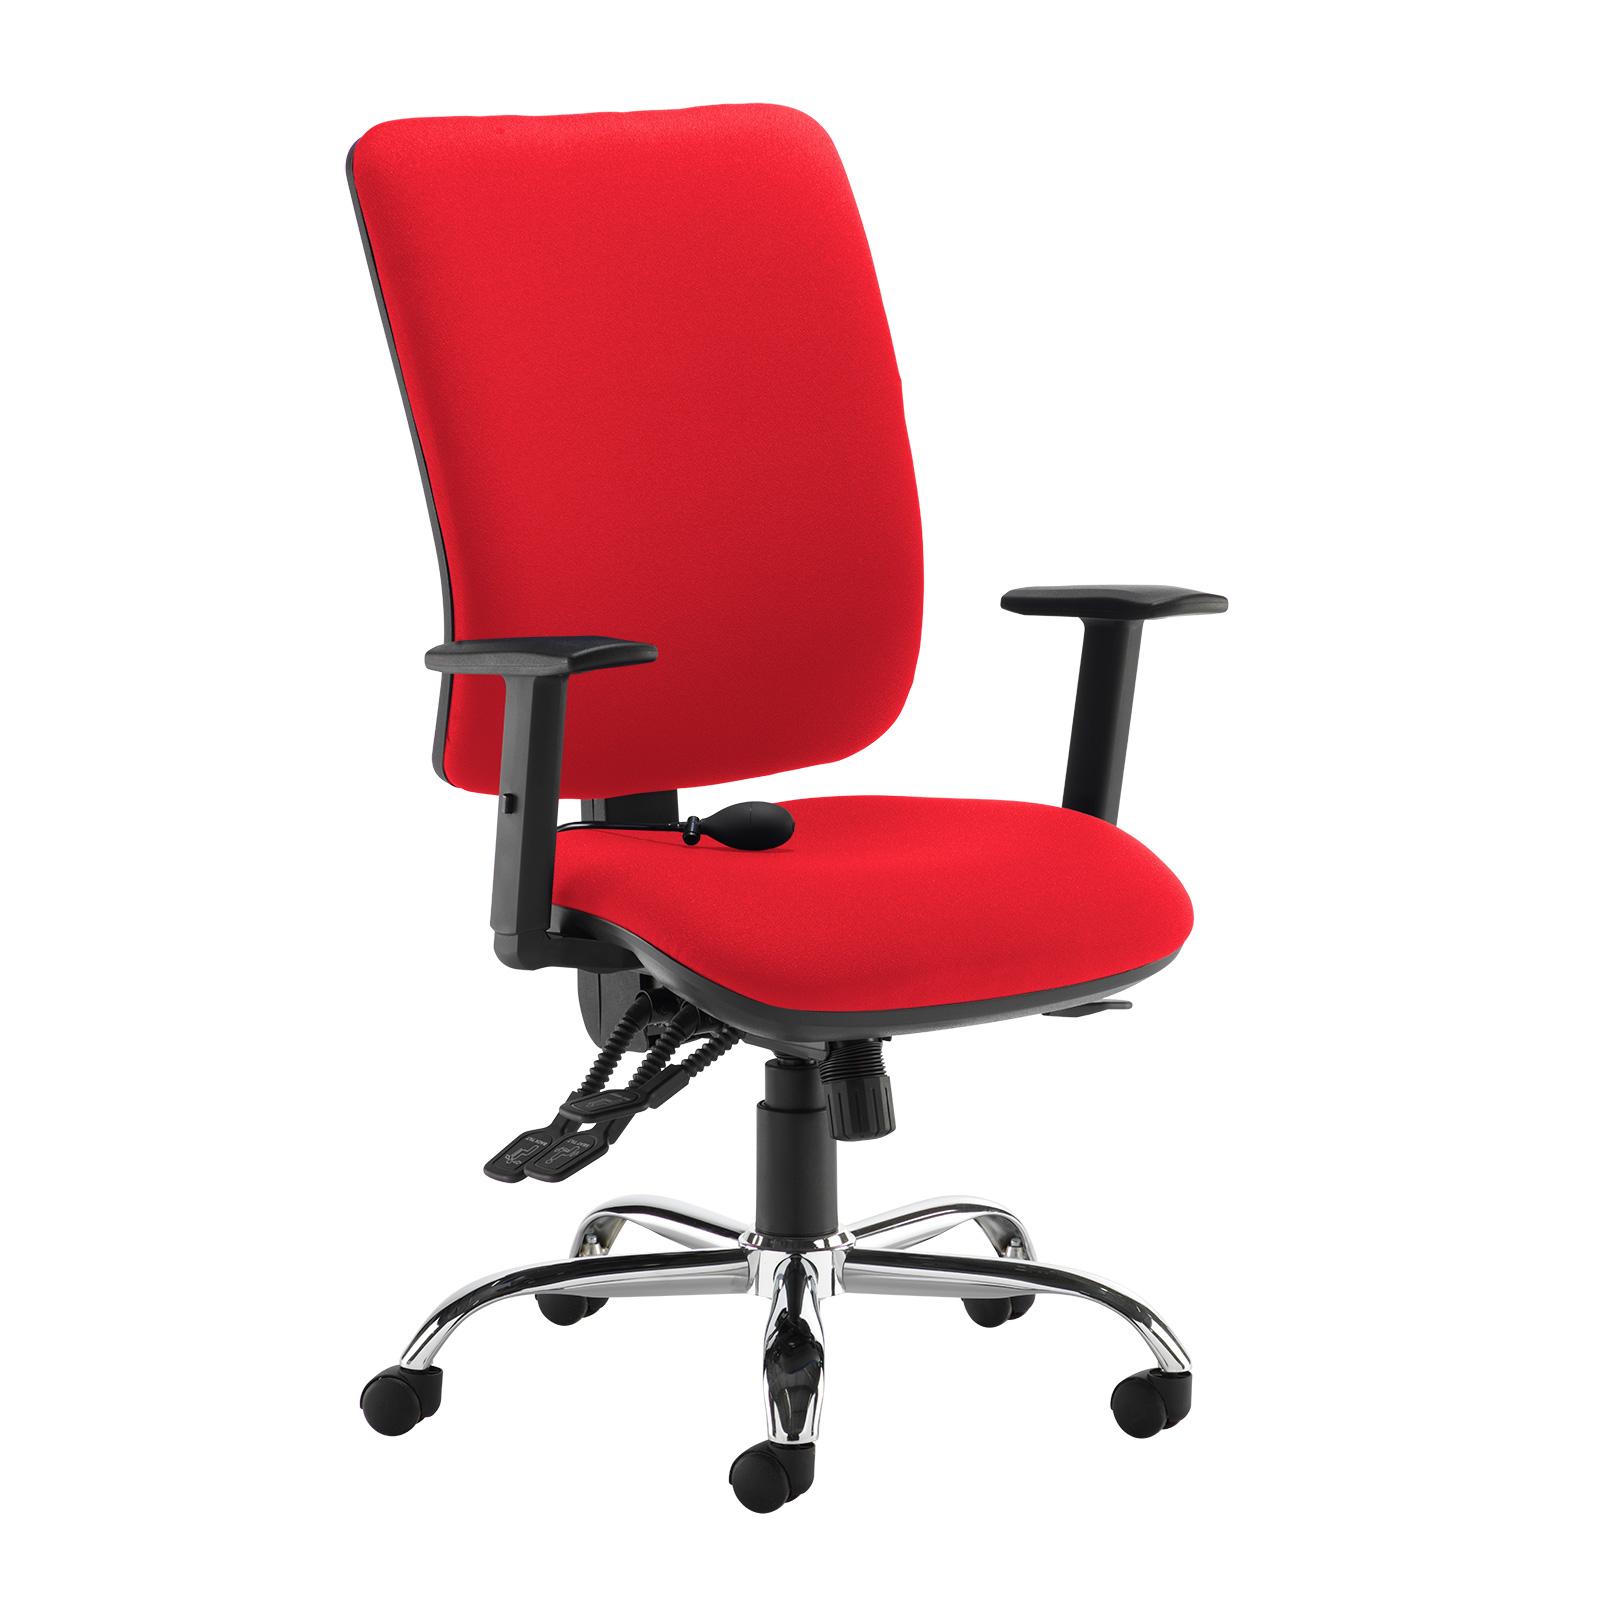 Senza ergo 24hr ergonomic asynchro task chair - red